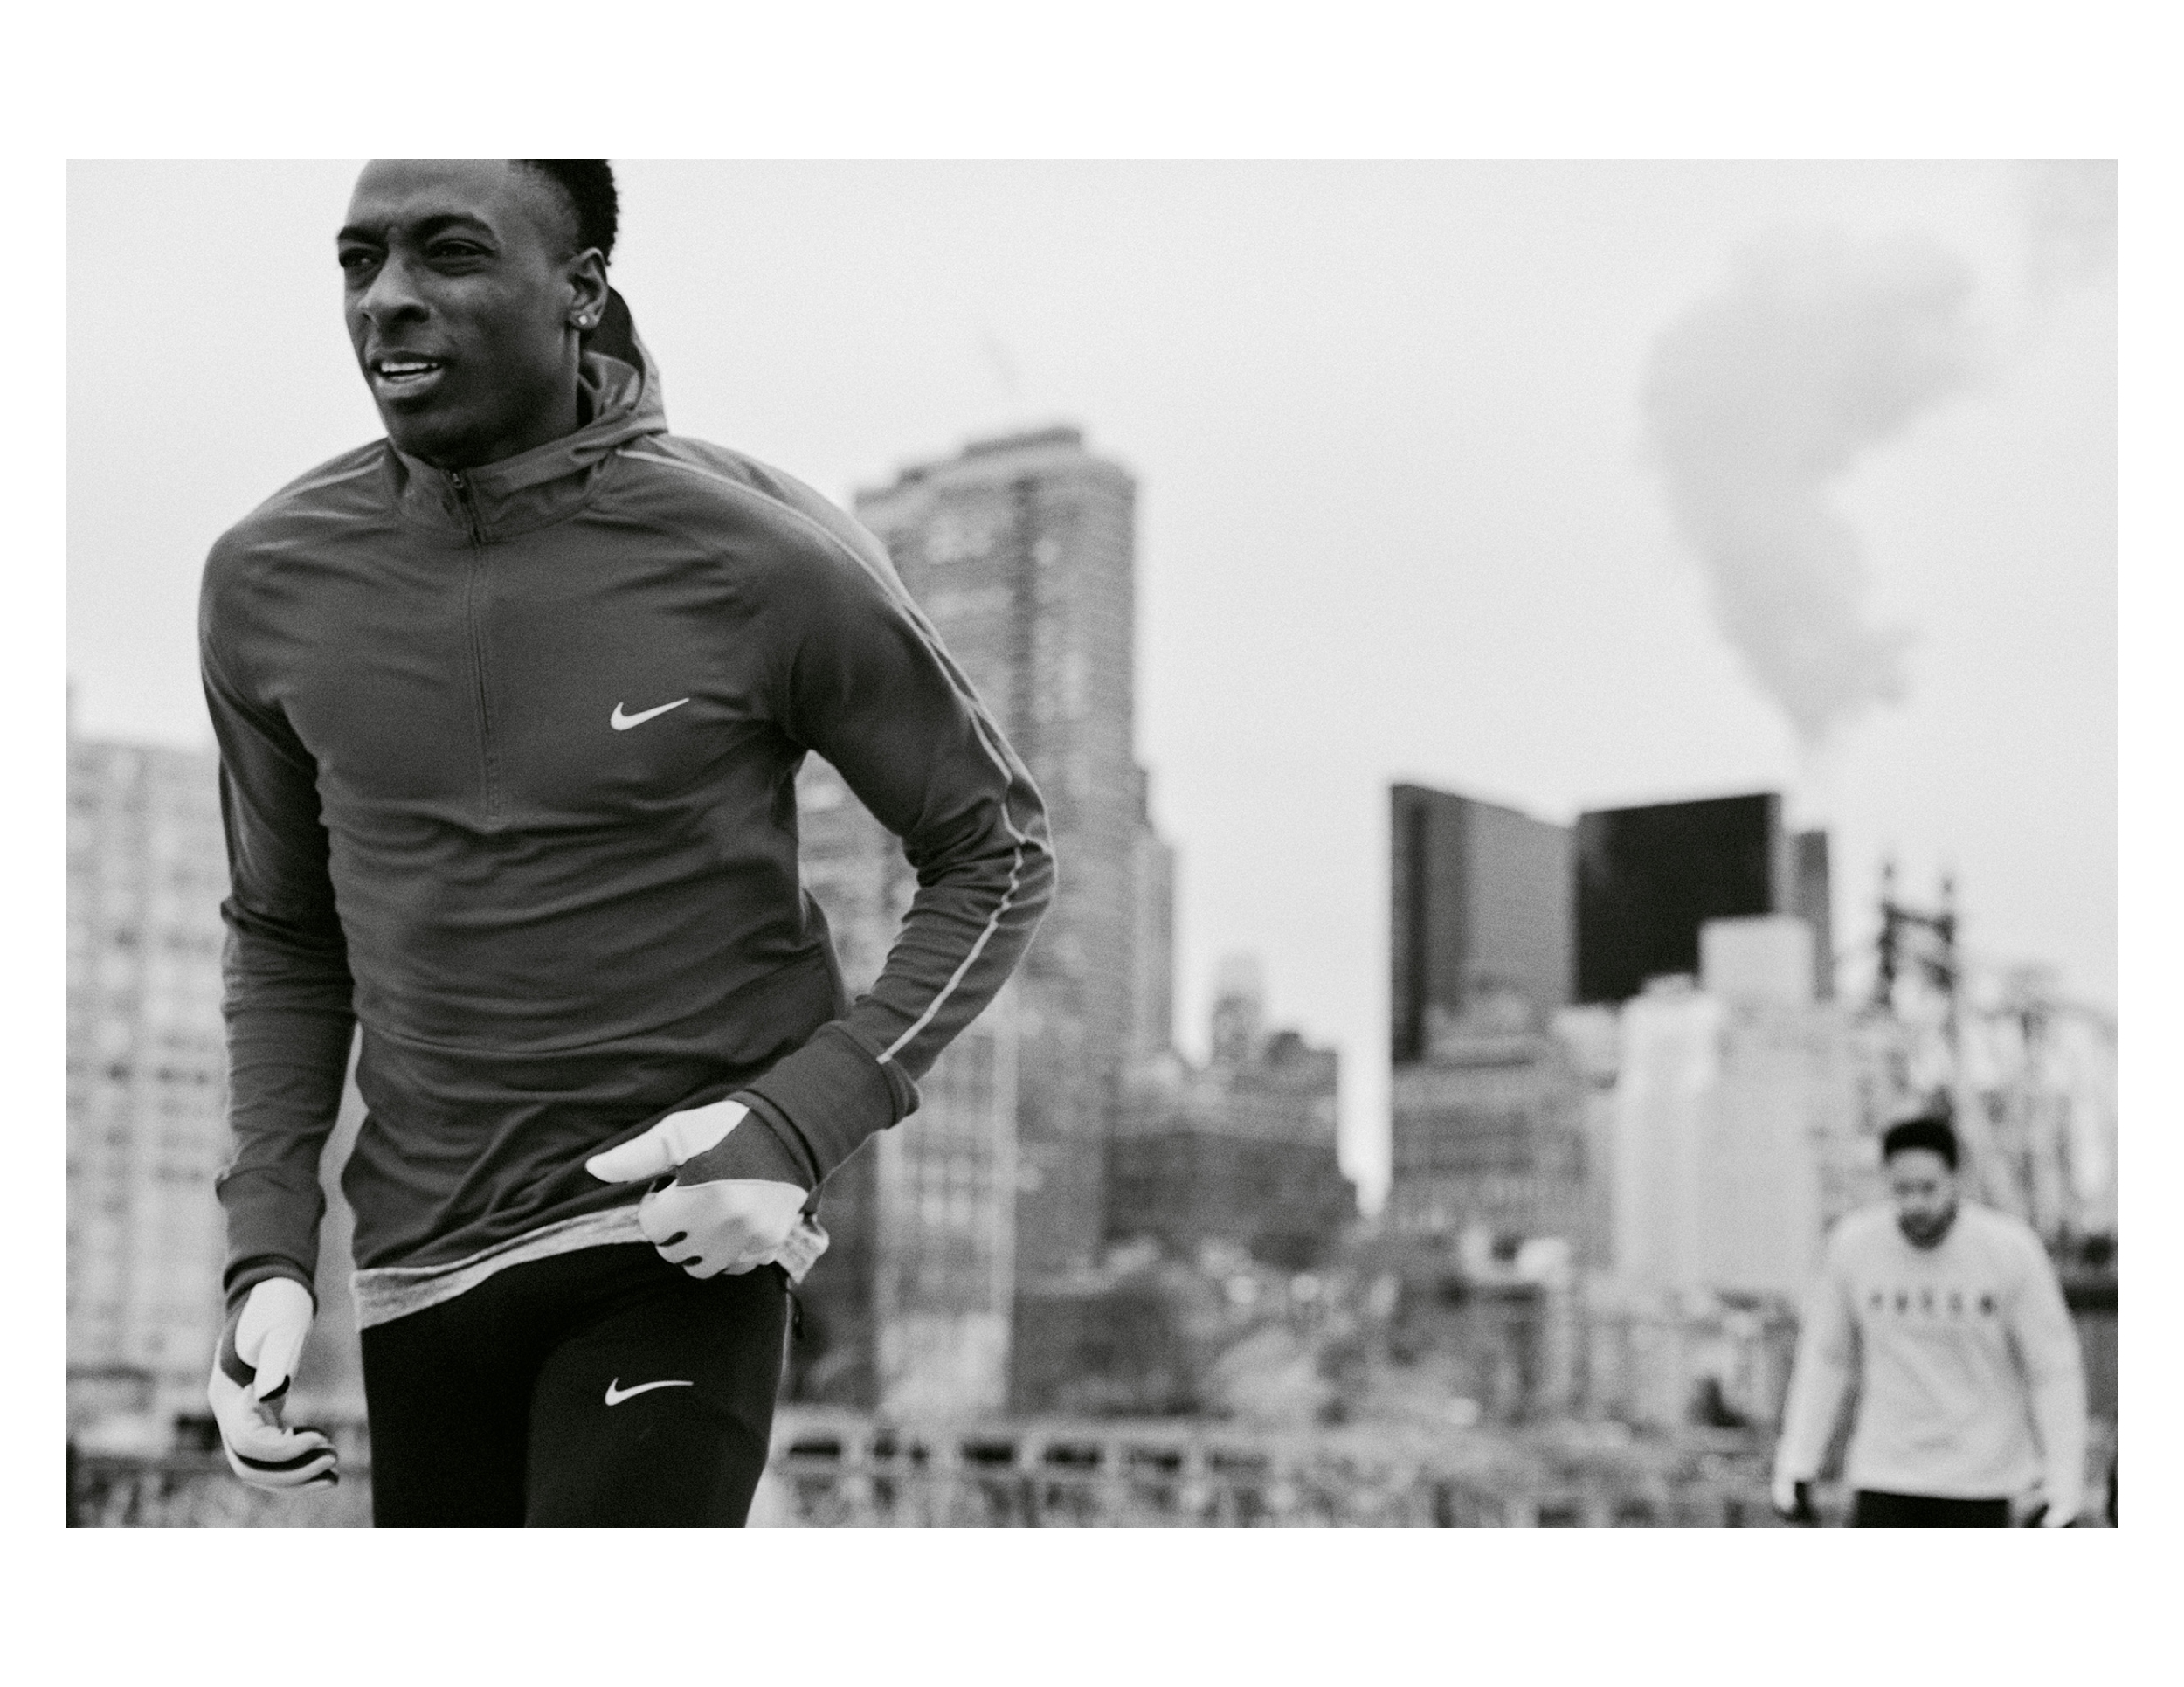 NikeLunarTempo_Slide4.jpg